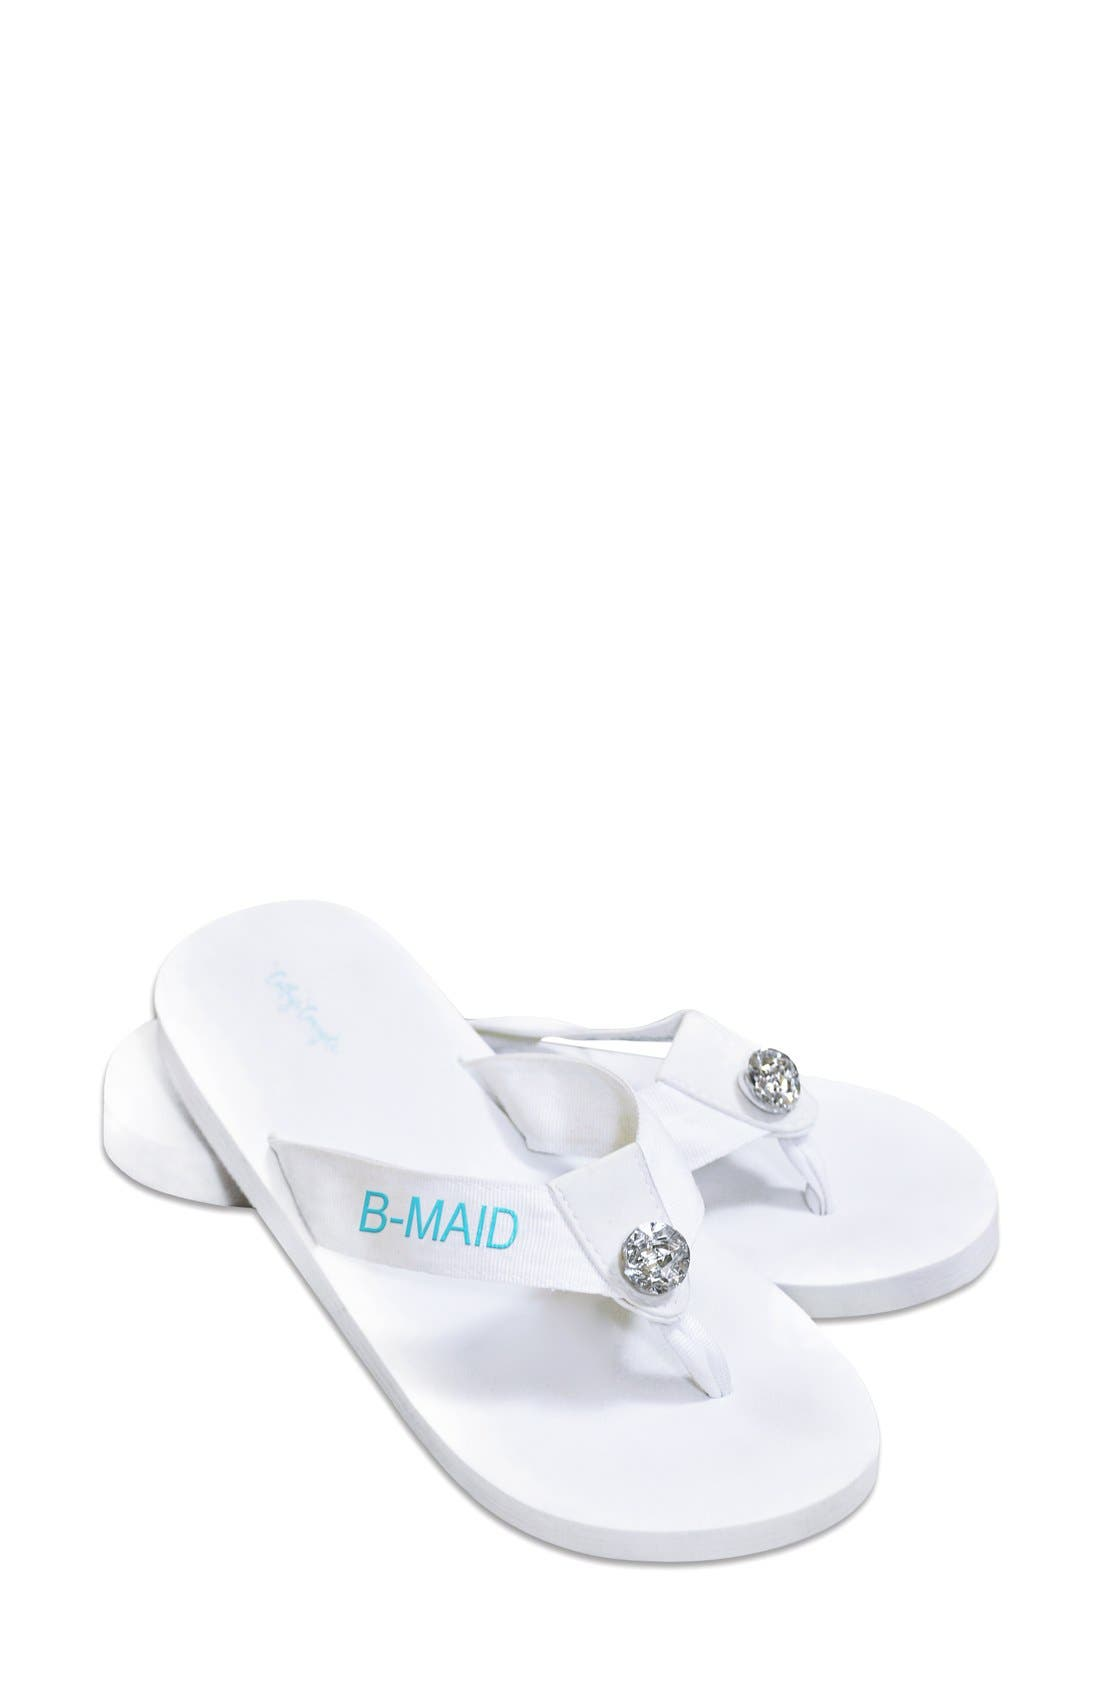 'Bridesmaid' Personalized Flip Flops,                         Main,                         color, 100